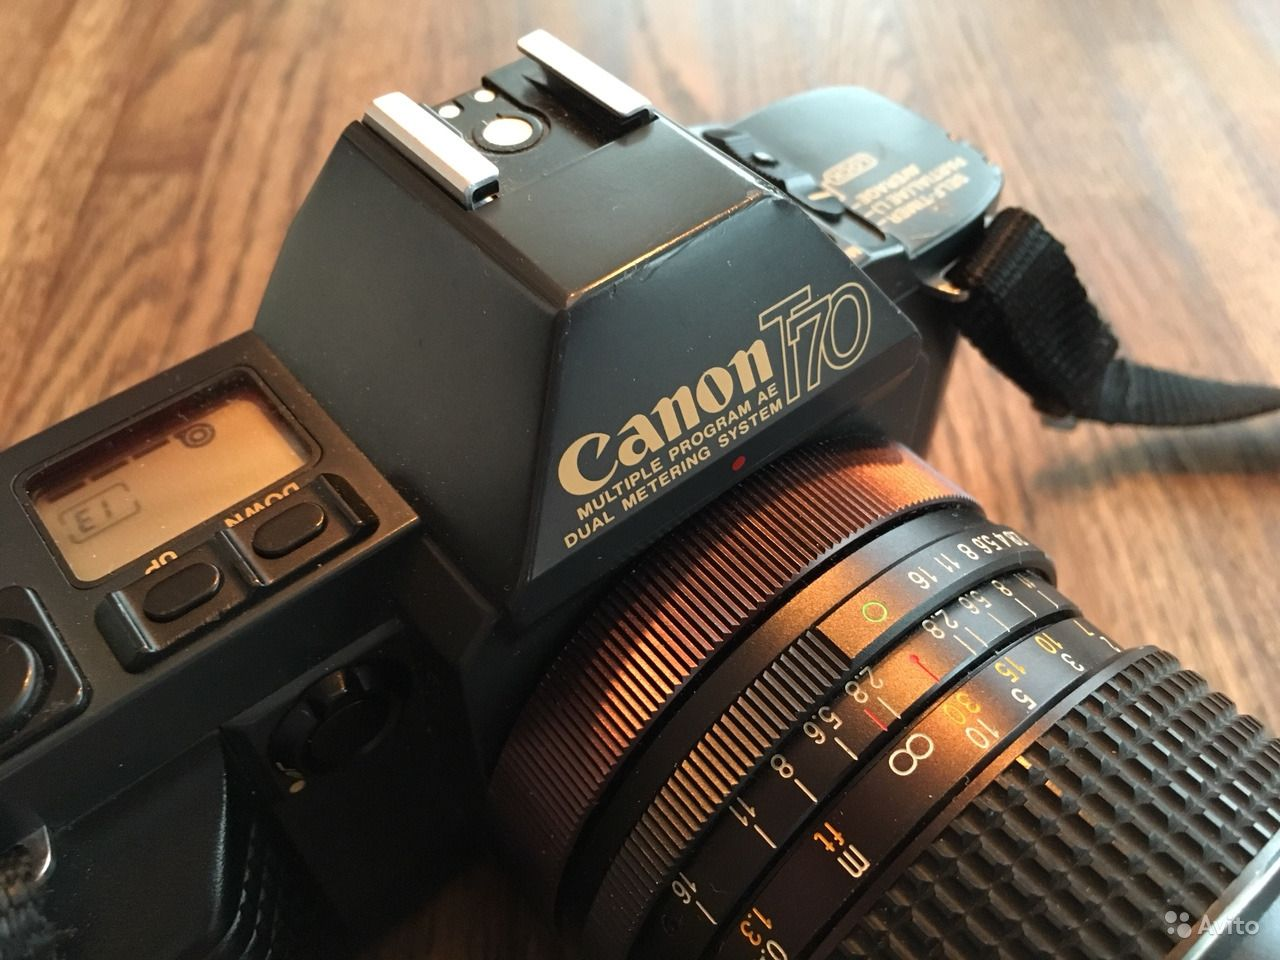 разных отснятая пленка фотоаппарата клеевых